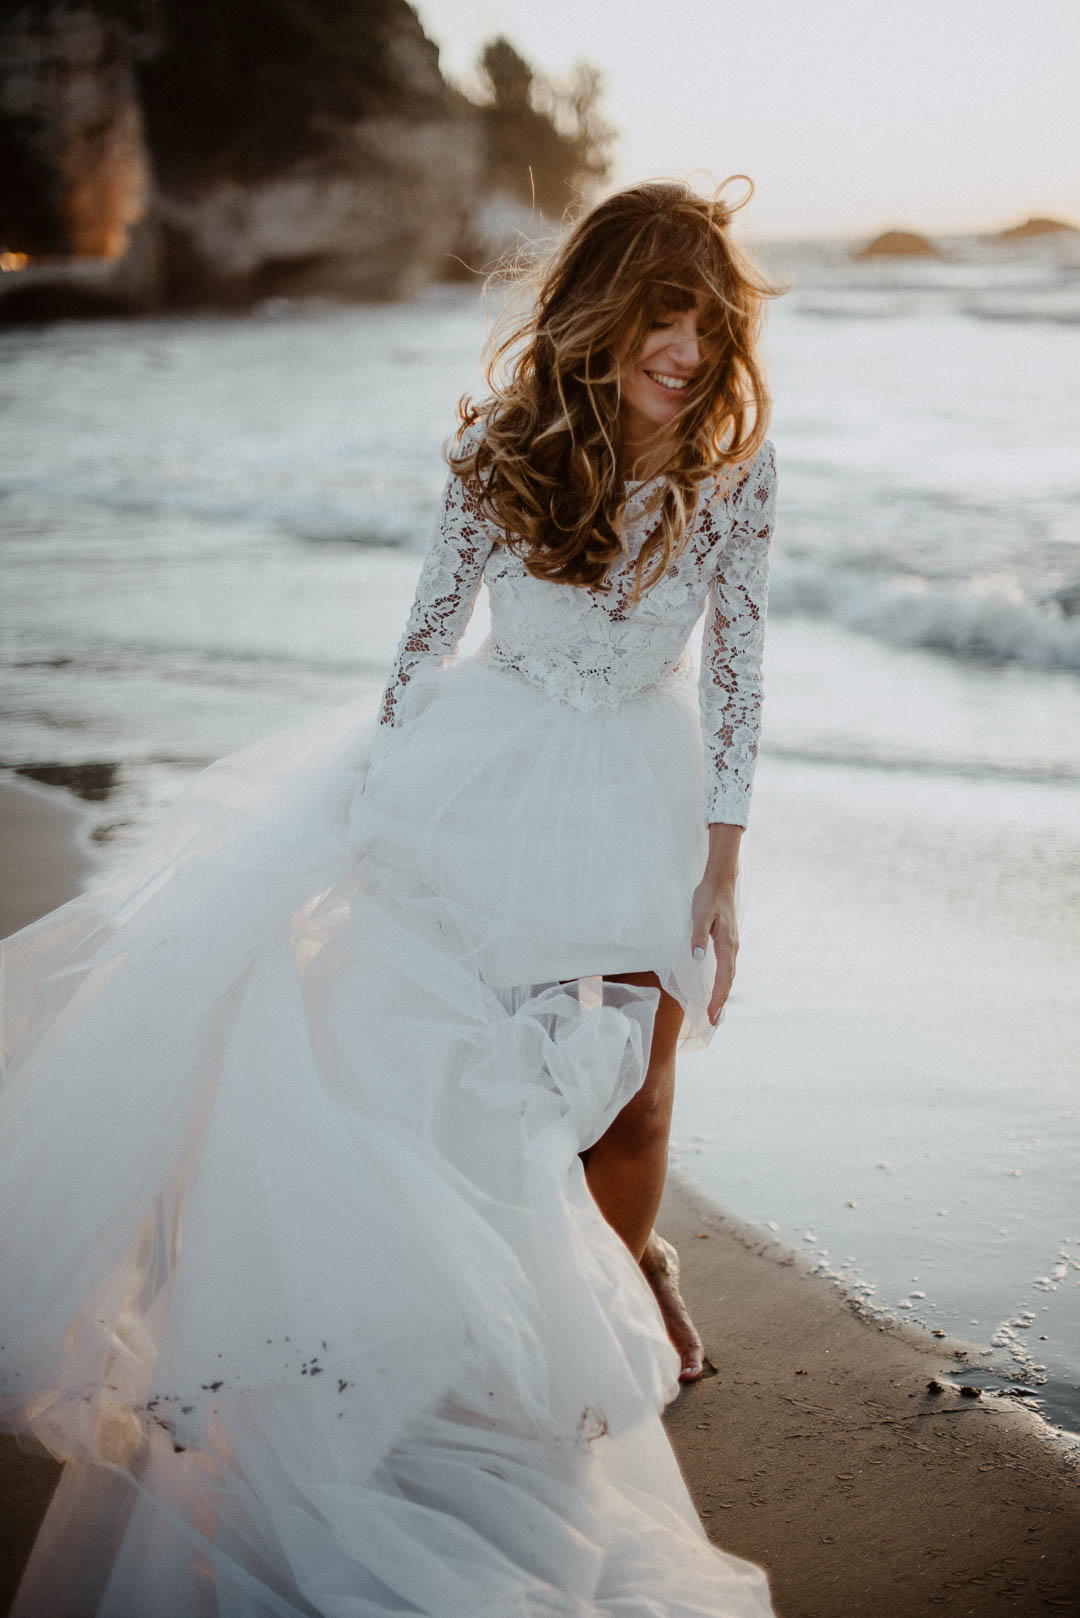 wedding-photographer-destination-fineart-bespoke-reportage-napoli-nabilah-vivianeizzo-spazio46-121